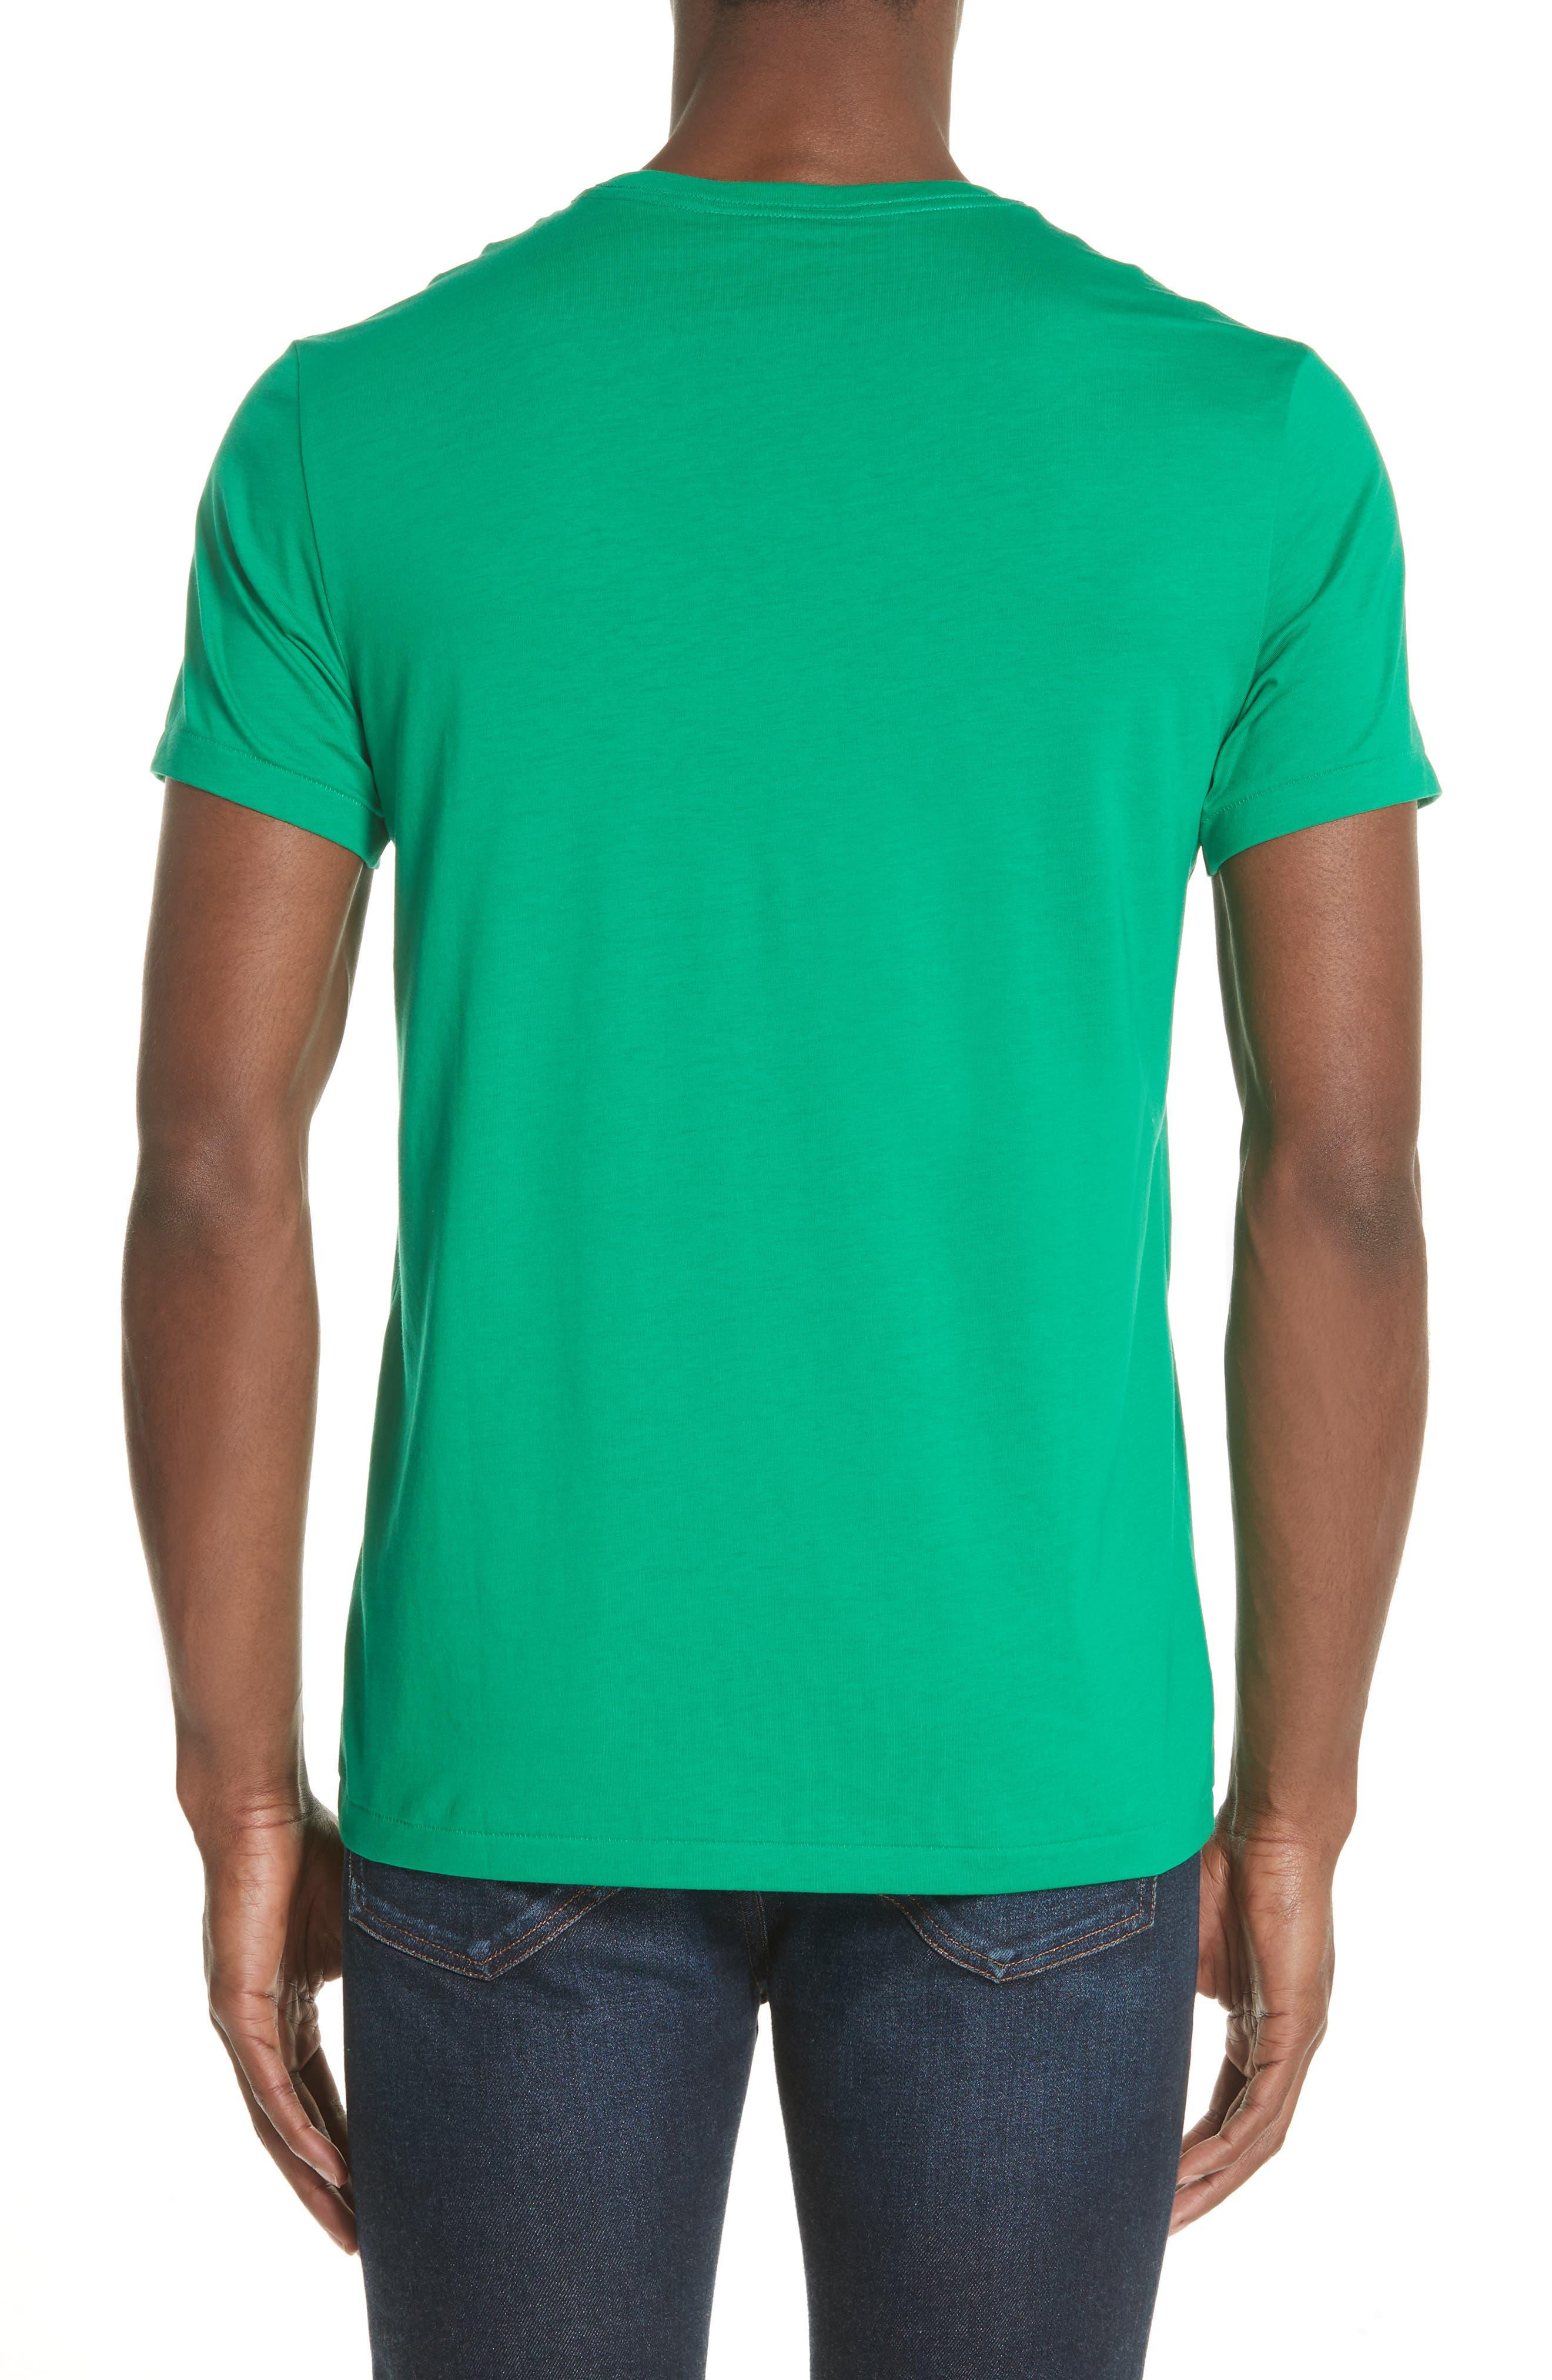 Jadford V-Neck T-Shirt,                             Alternate thumbnail 2, color,                             BRIGHT GREEN